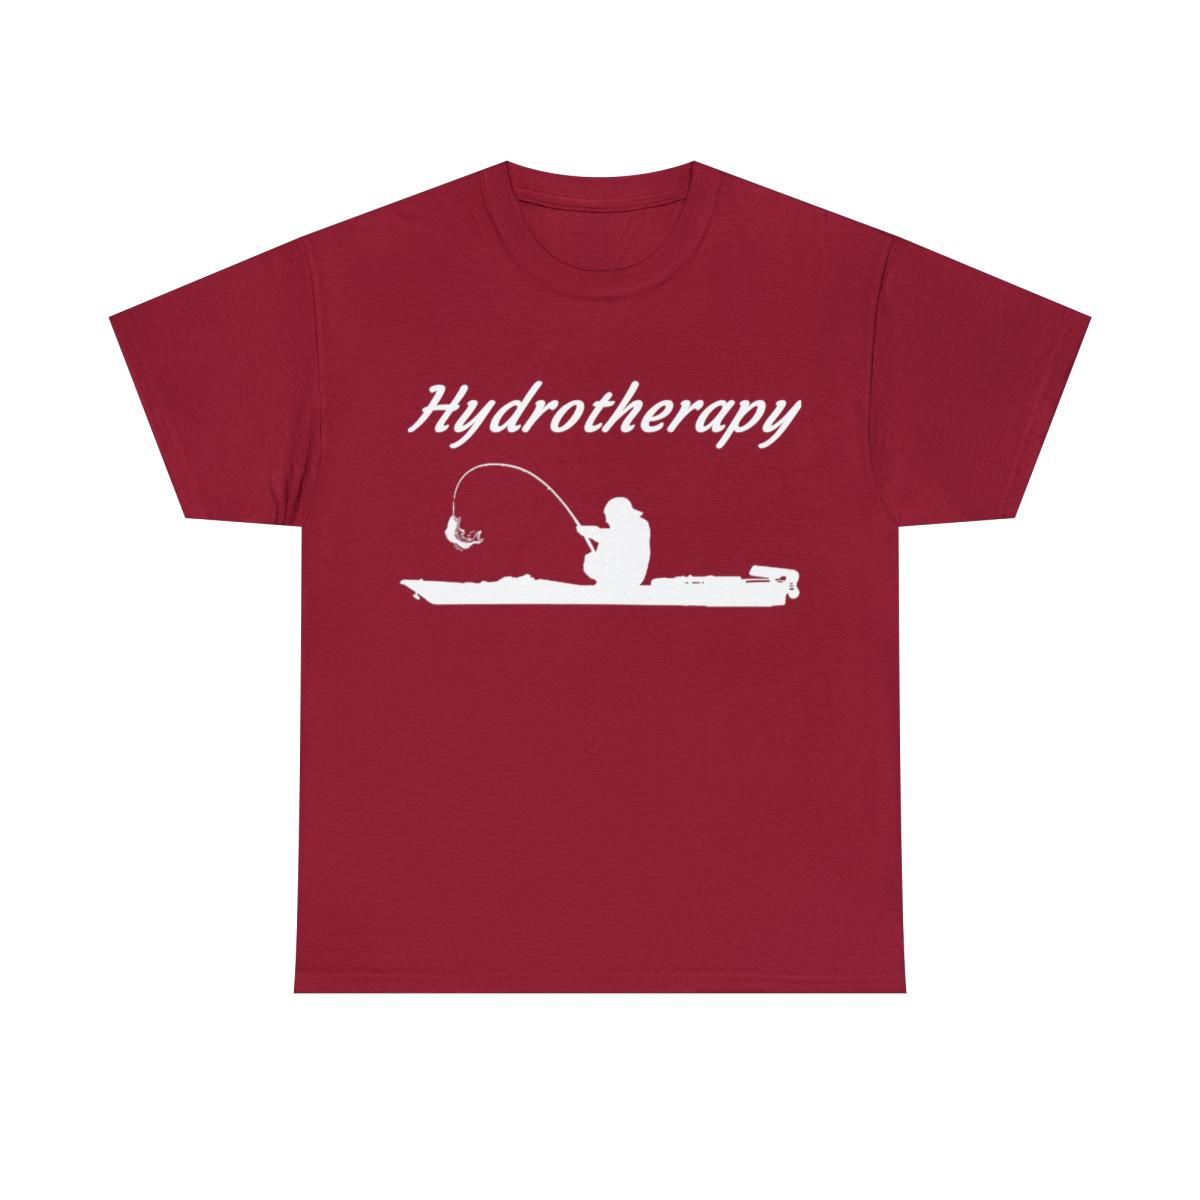 Hydrotherapy-Kayak-T-Shirt-Kayak-Fishing-Unisex-Heavy-Cotton-T-Shirt thumbnail 17